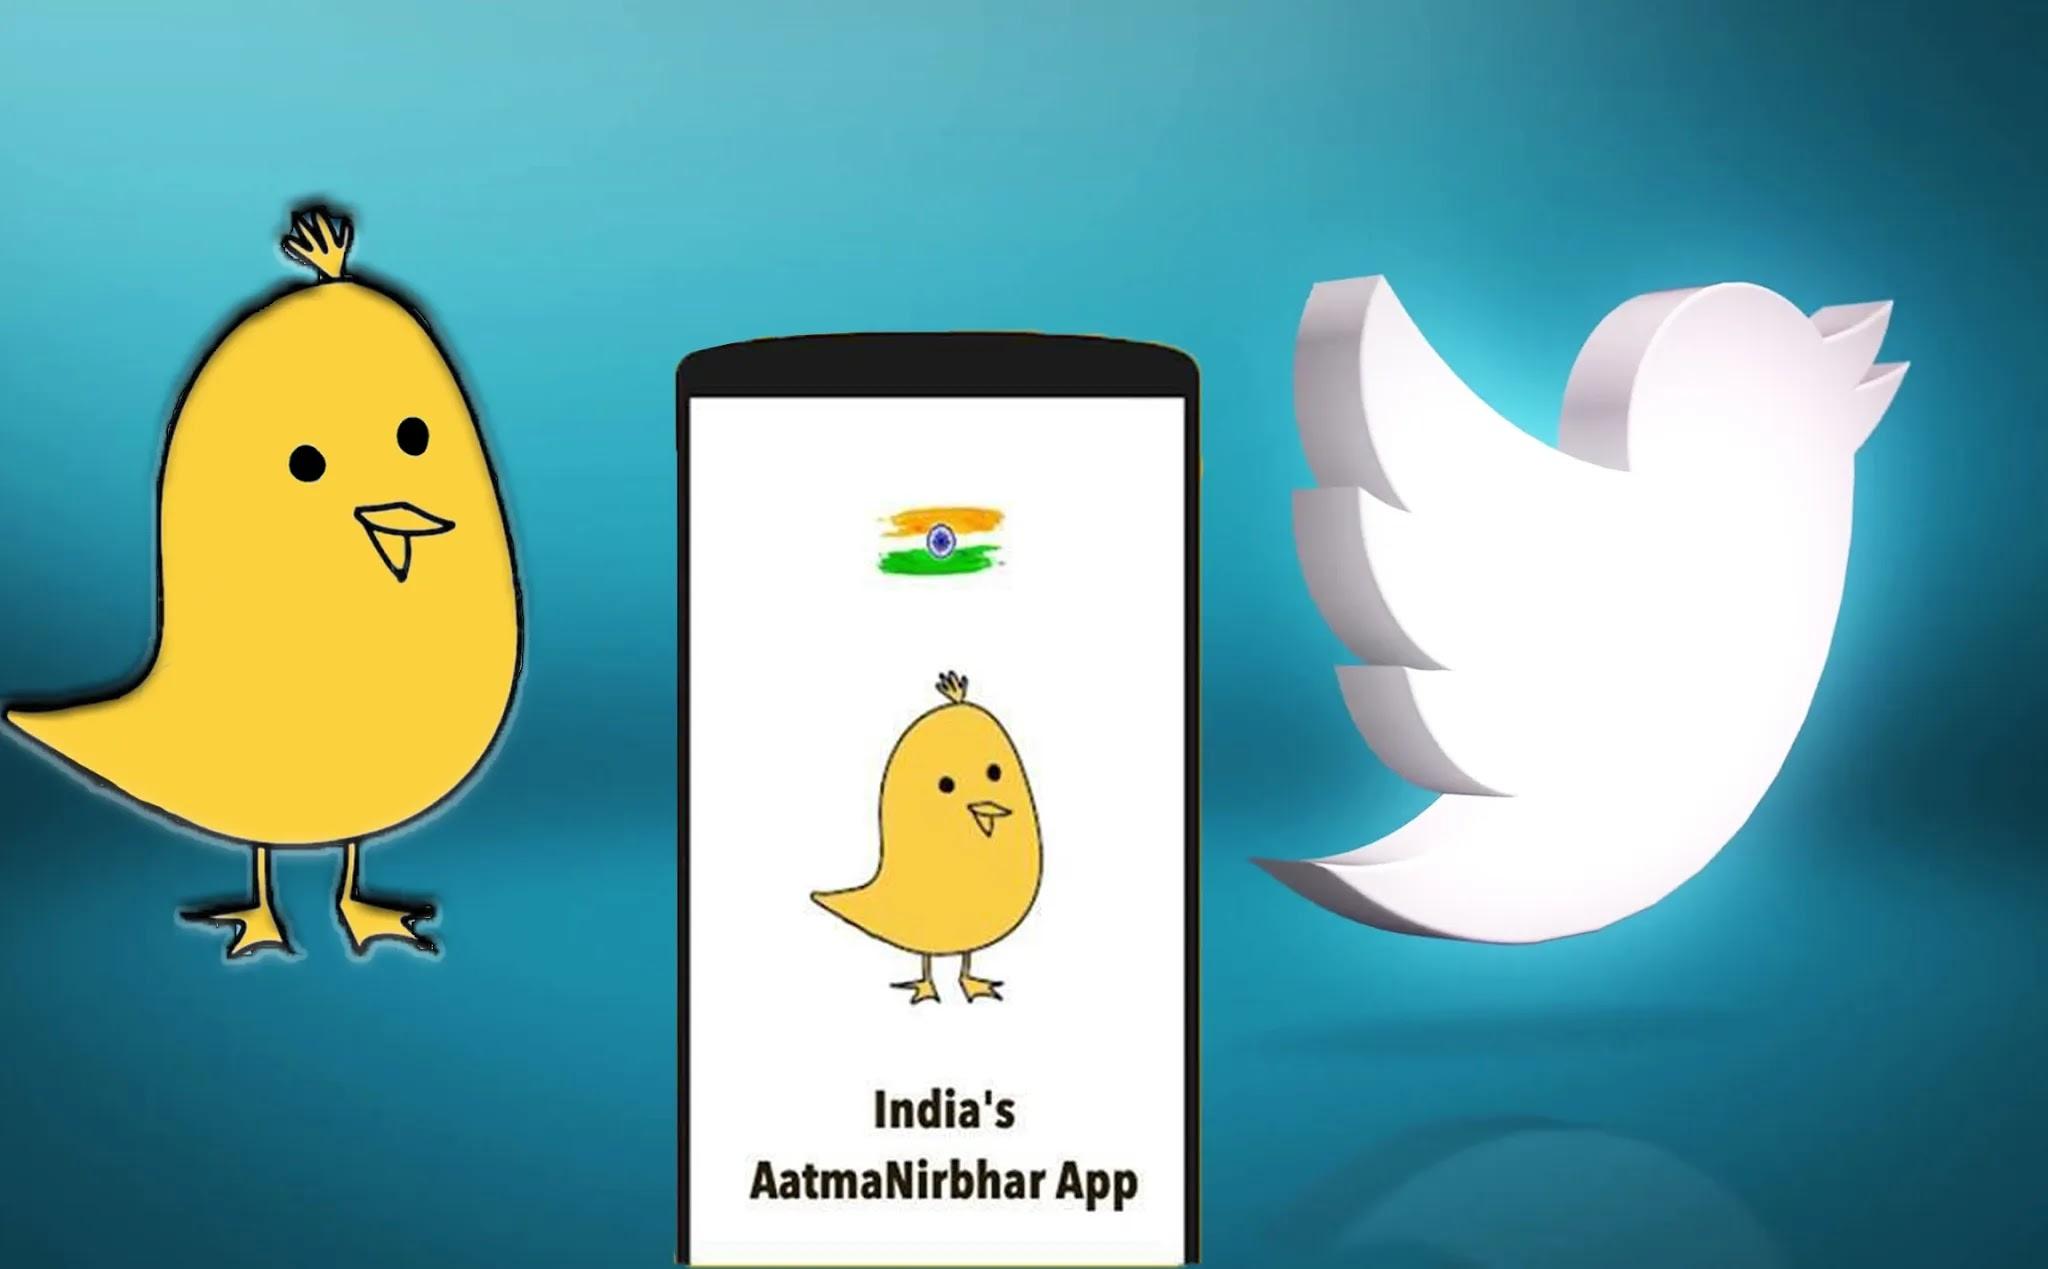 Twitter Launched Desi Twitter Koo App